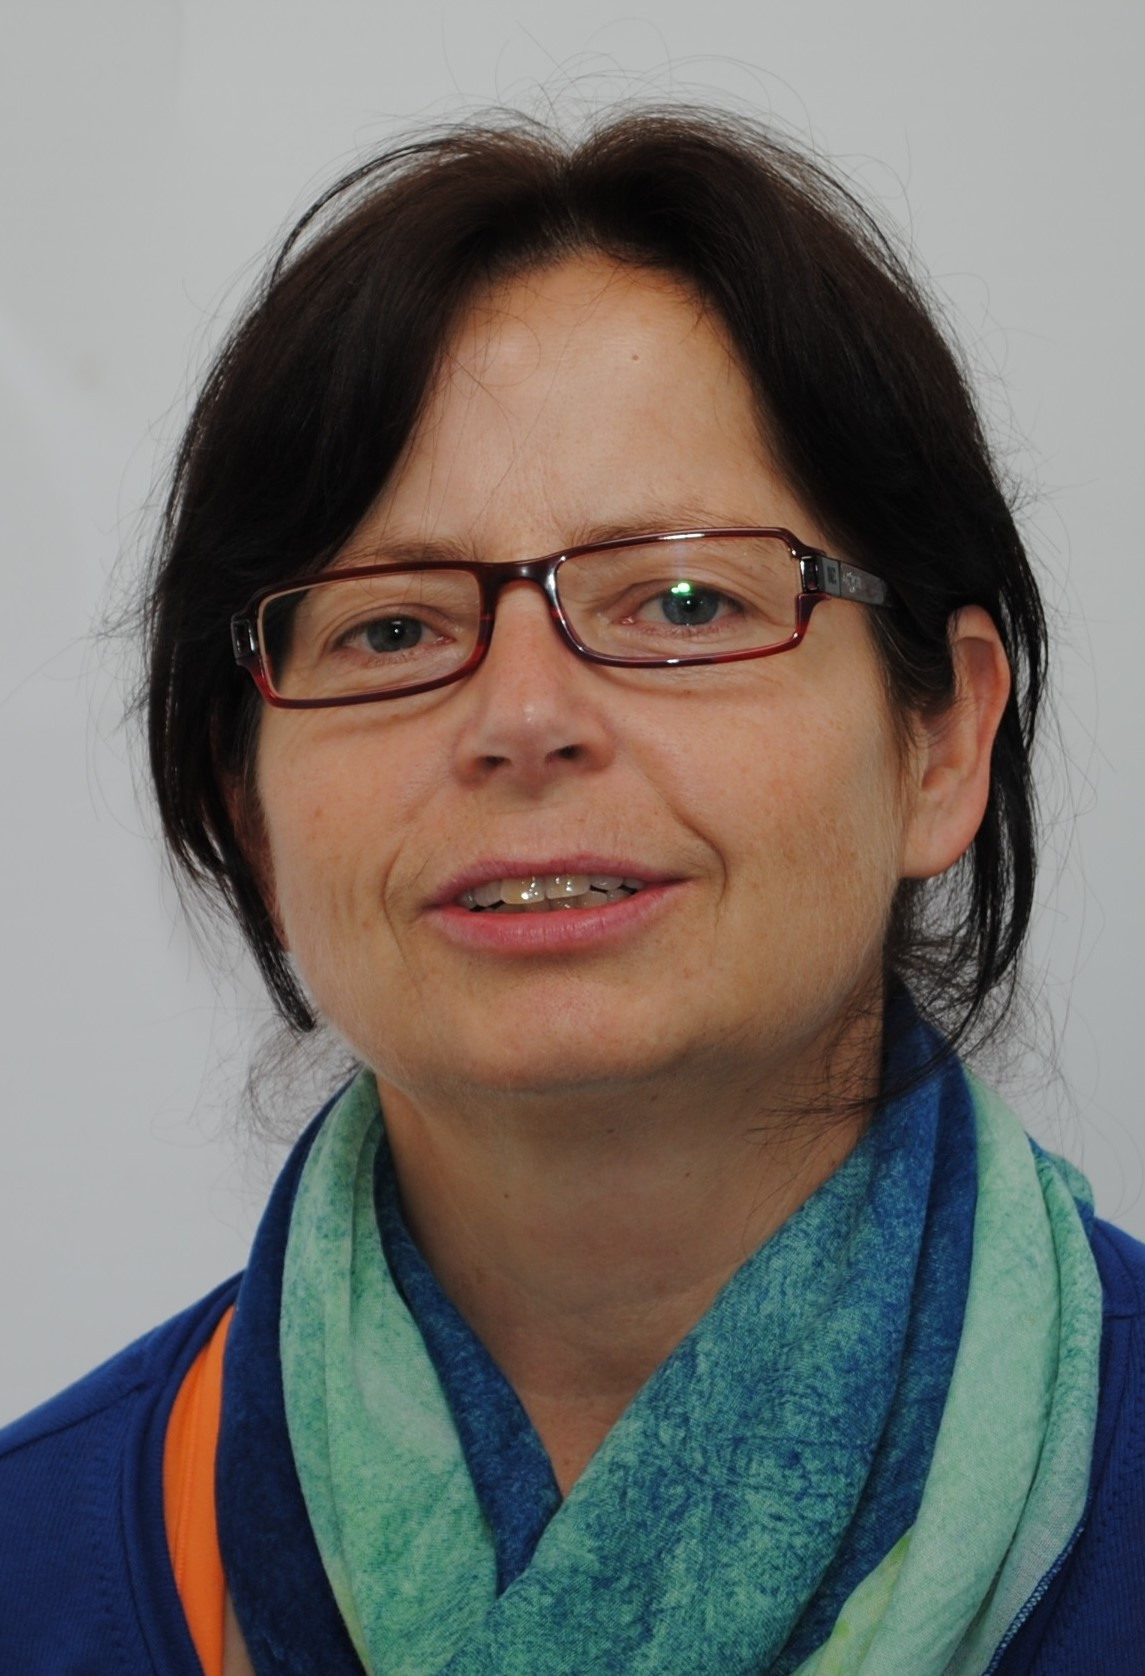 Obermühlner Karin 2021